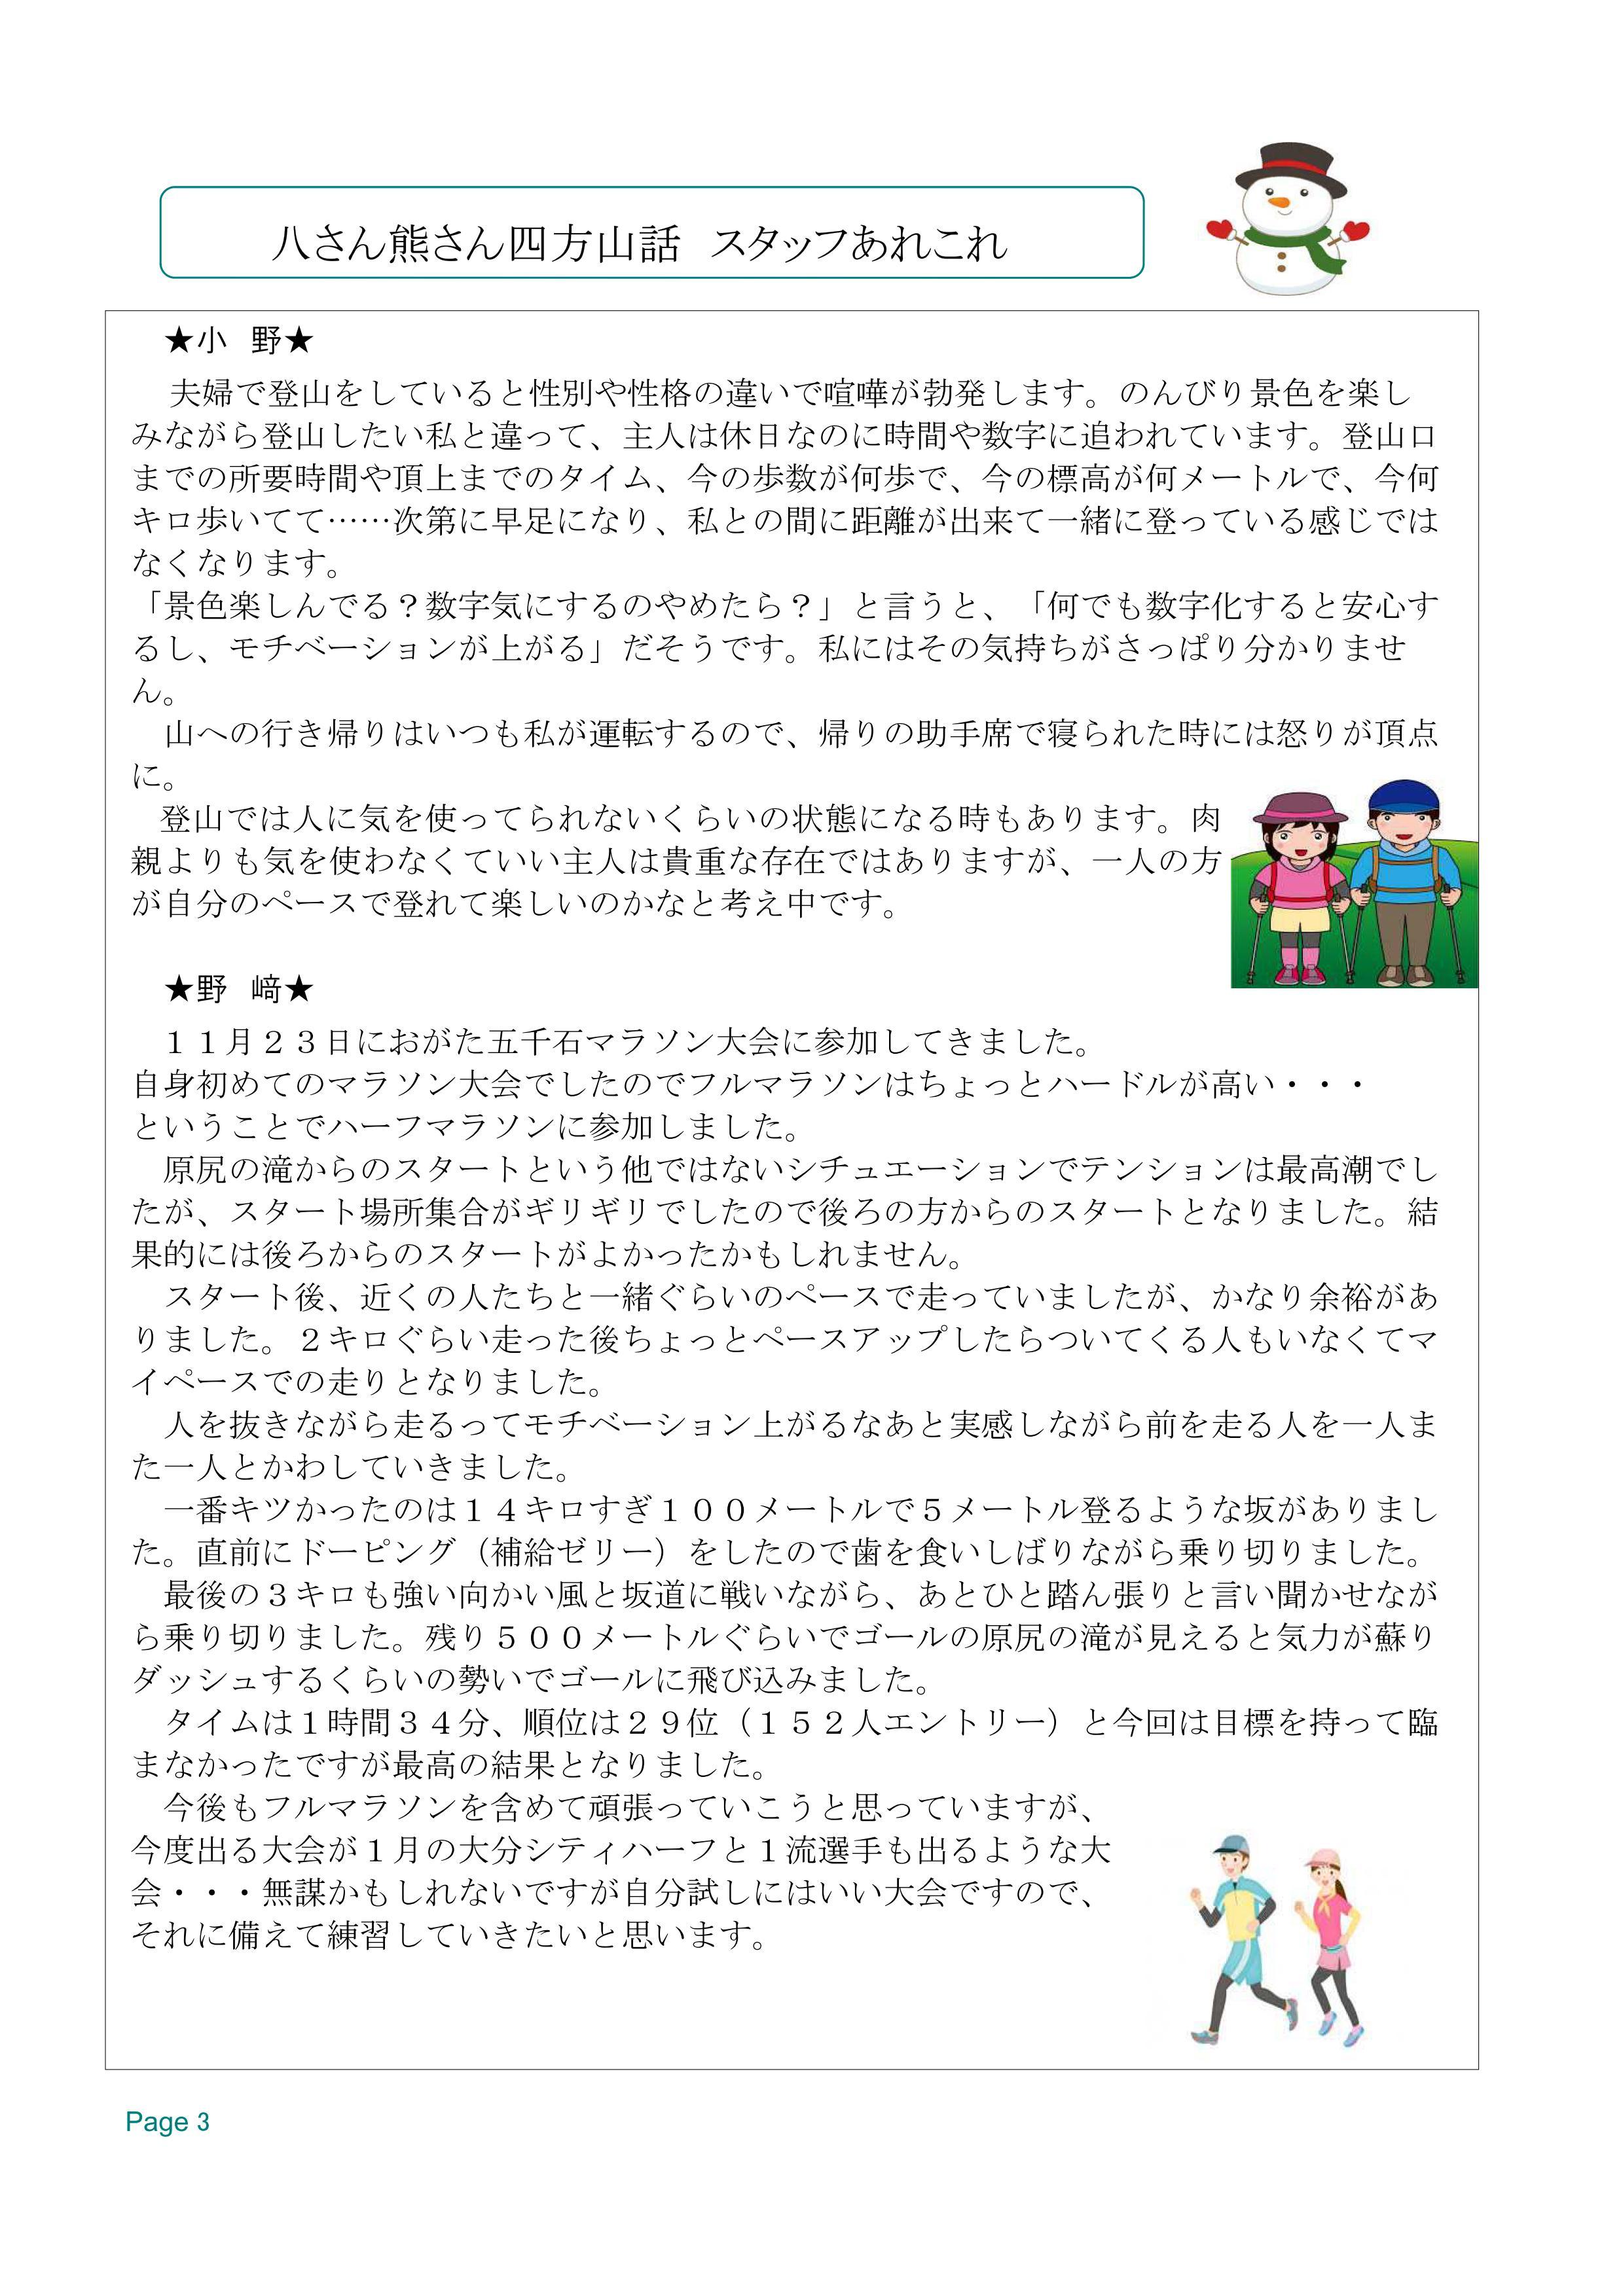 NLH29.12_03.jpg